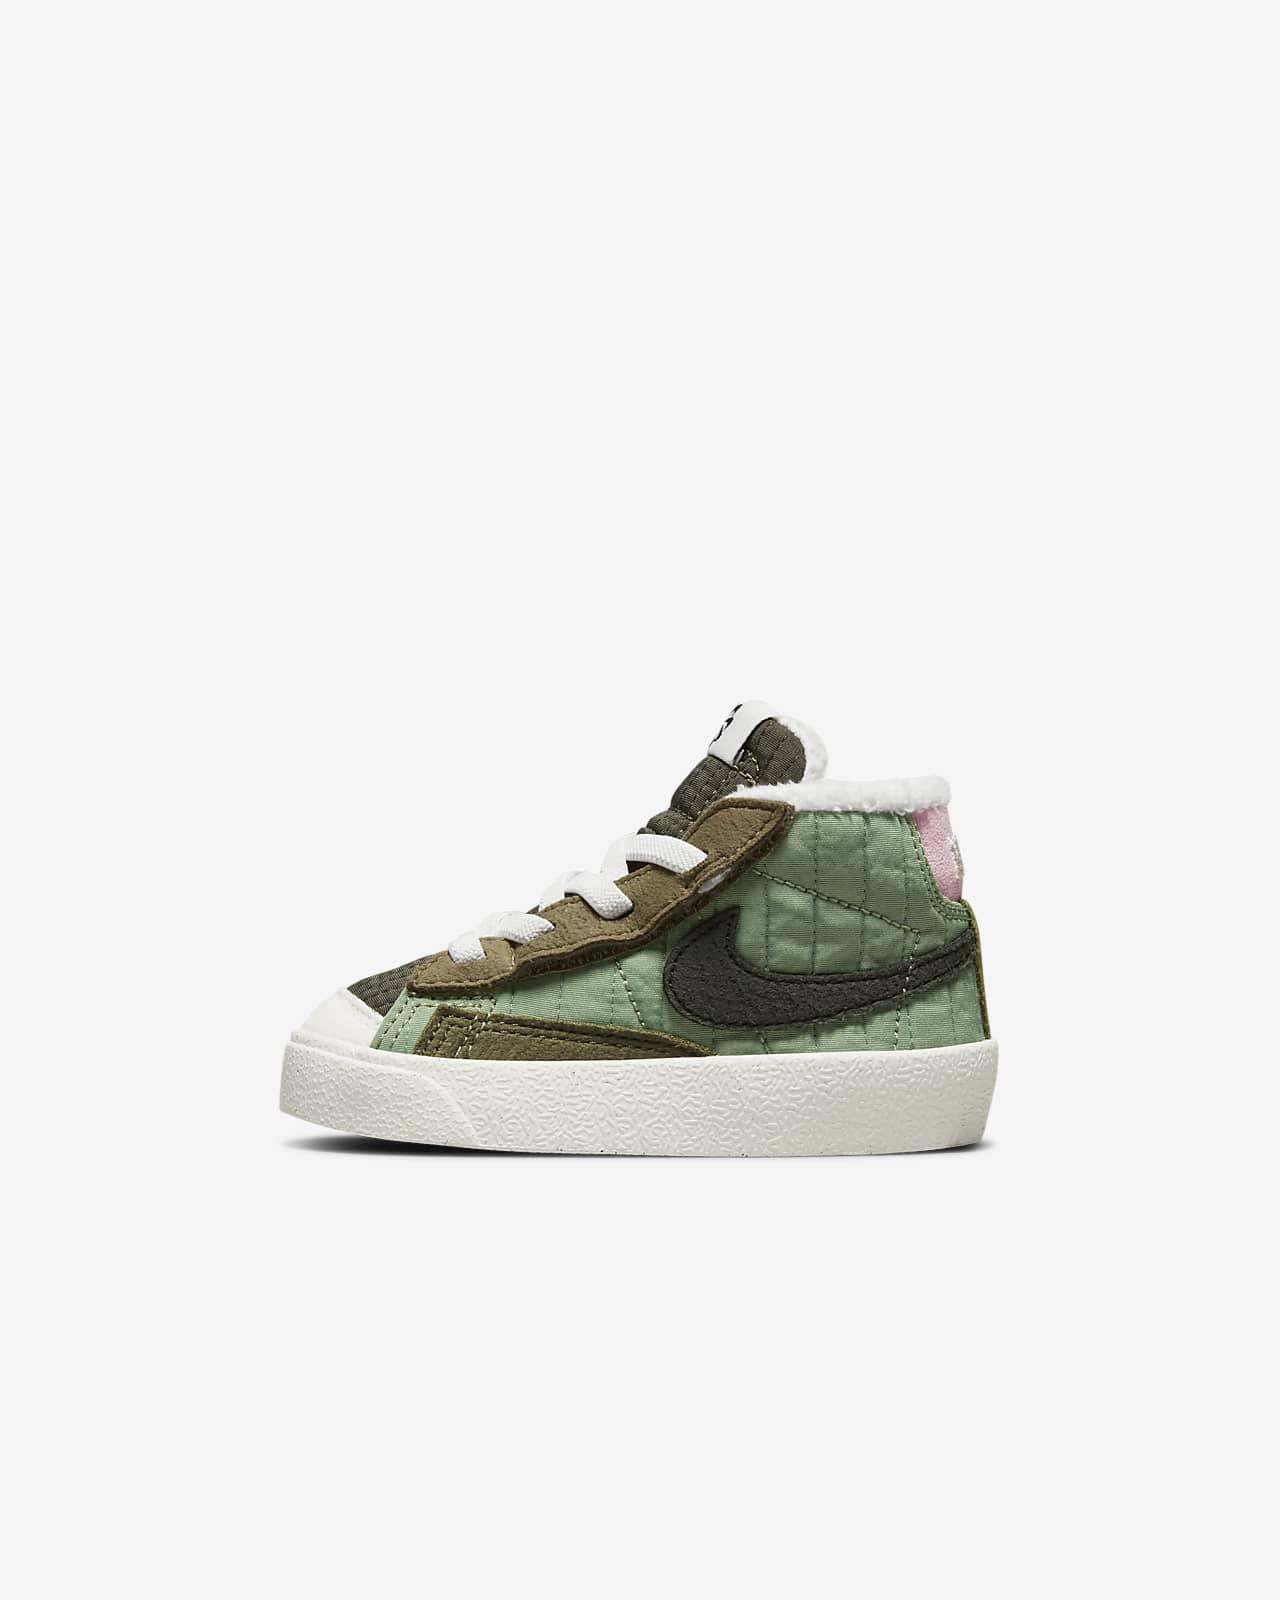 Nike Blazer Mid '77 Toddler Basketball Shoes